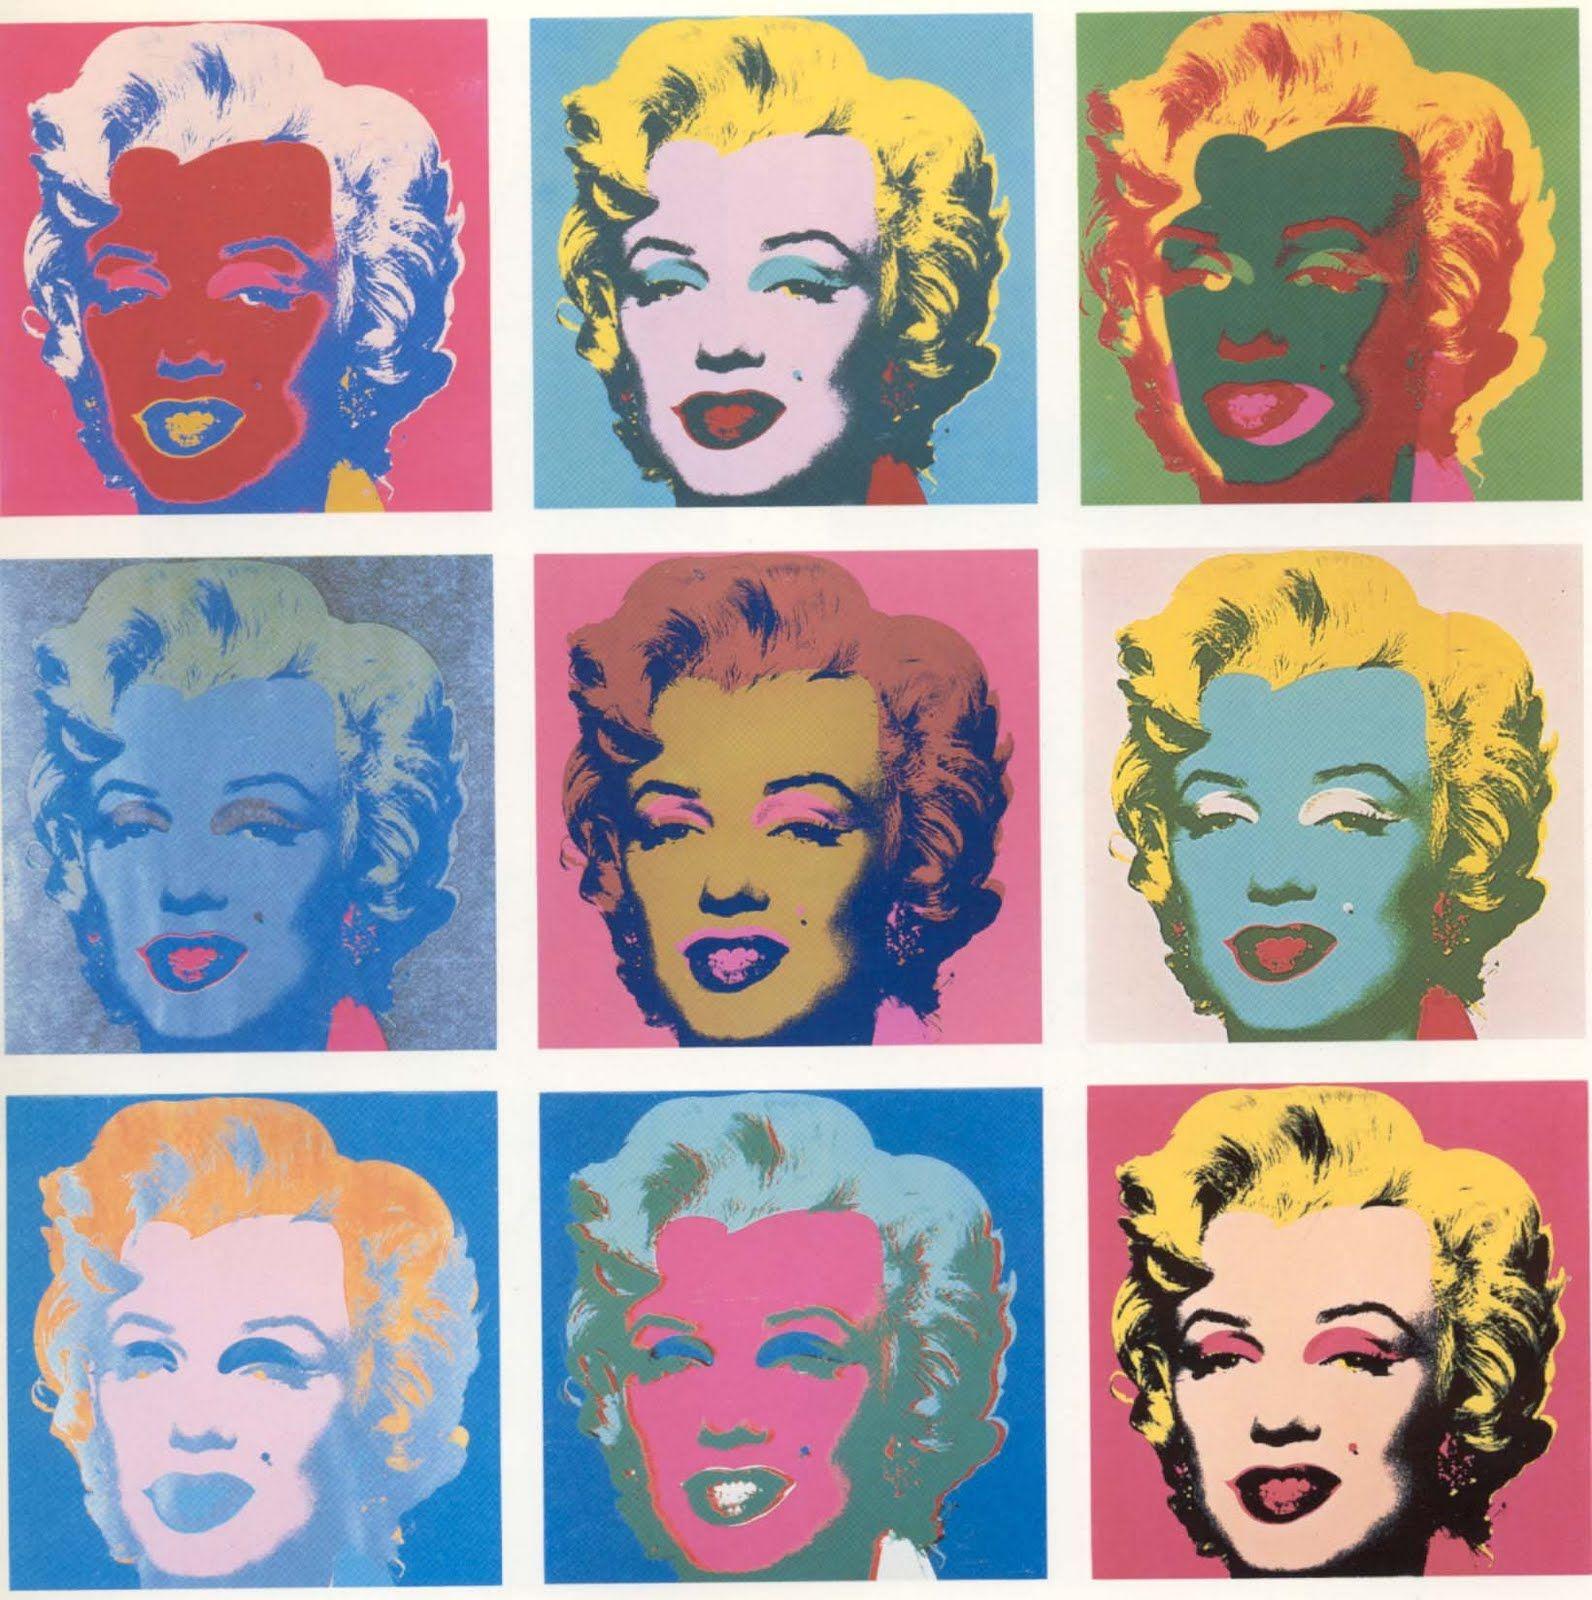 Andy Warhol Marilyn Monroe Andy Warhol Art Warhol Art Andy Warhol Marilyn